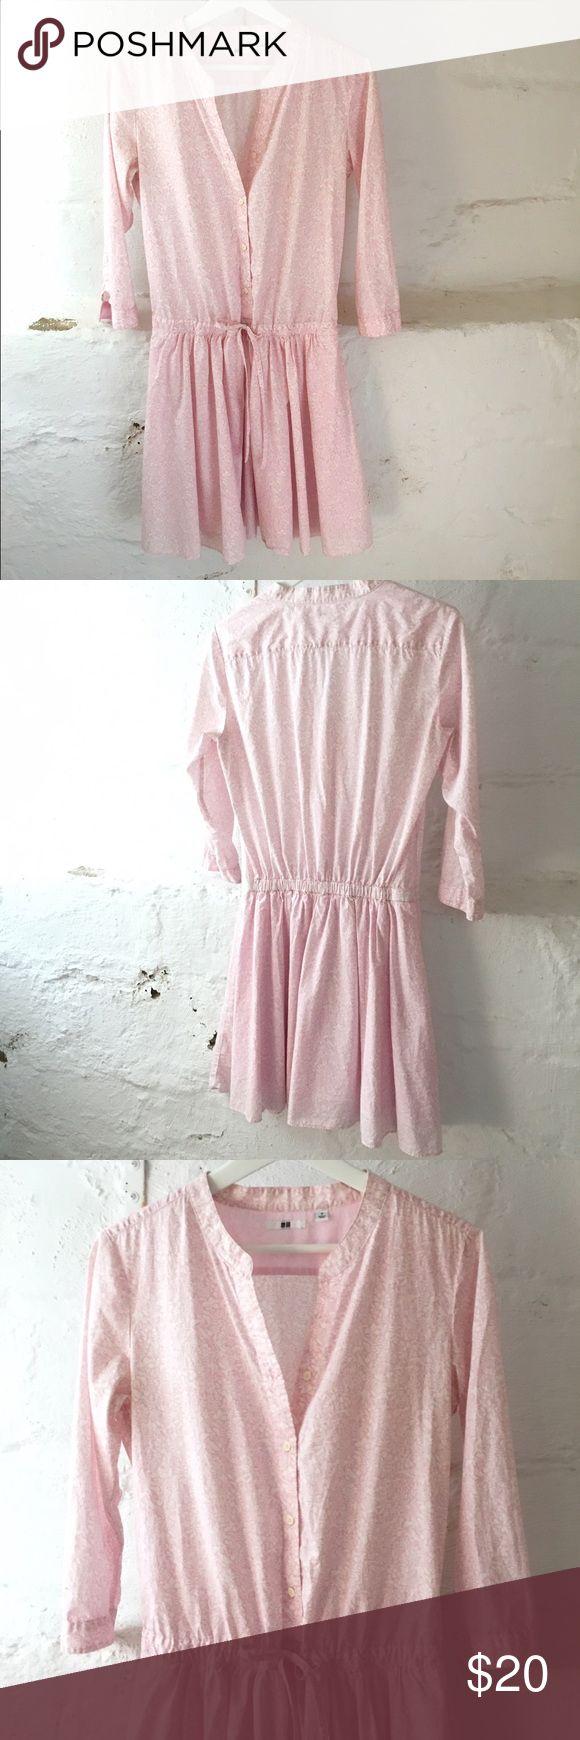 Uniqlo Cotton Shirt Dress Drawstring  Waist Shirt dress from Uniqlo. 100% Cotton. Lined Skirt Bottom. Excellent Condition Never  🚫no trades pls🚫 Uniqlo Dresses